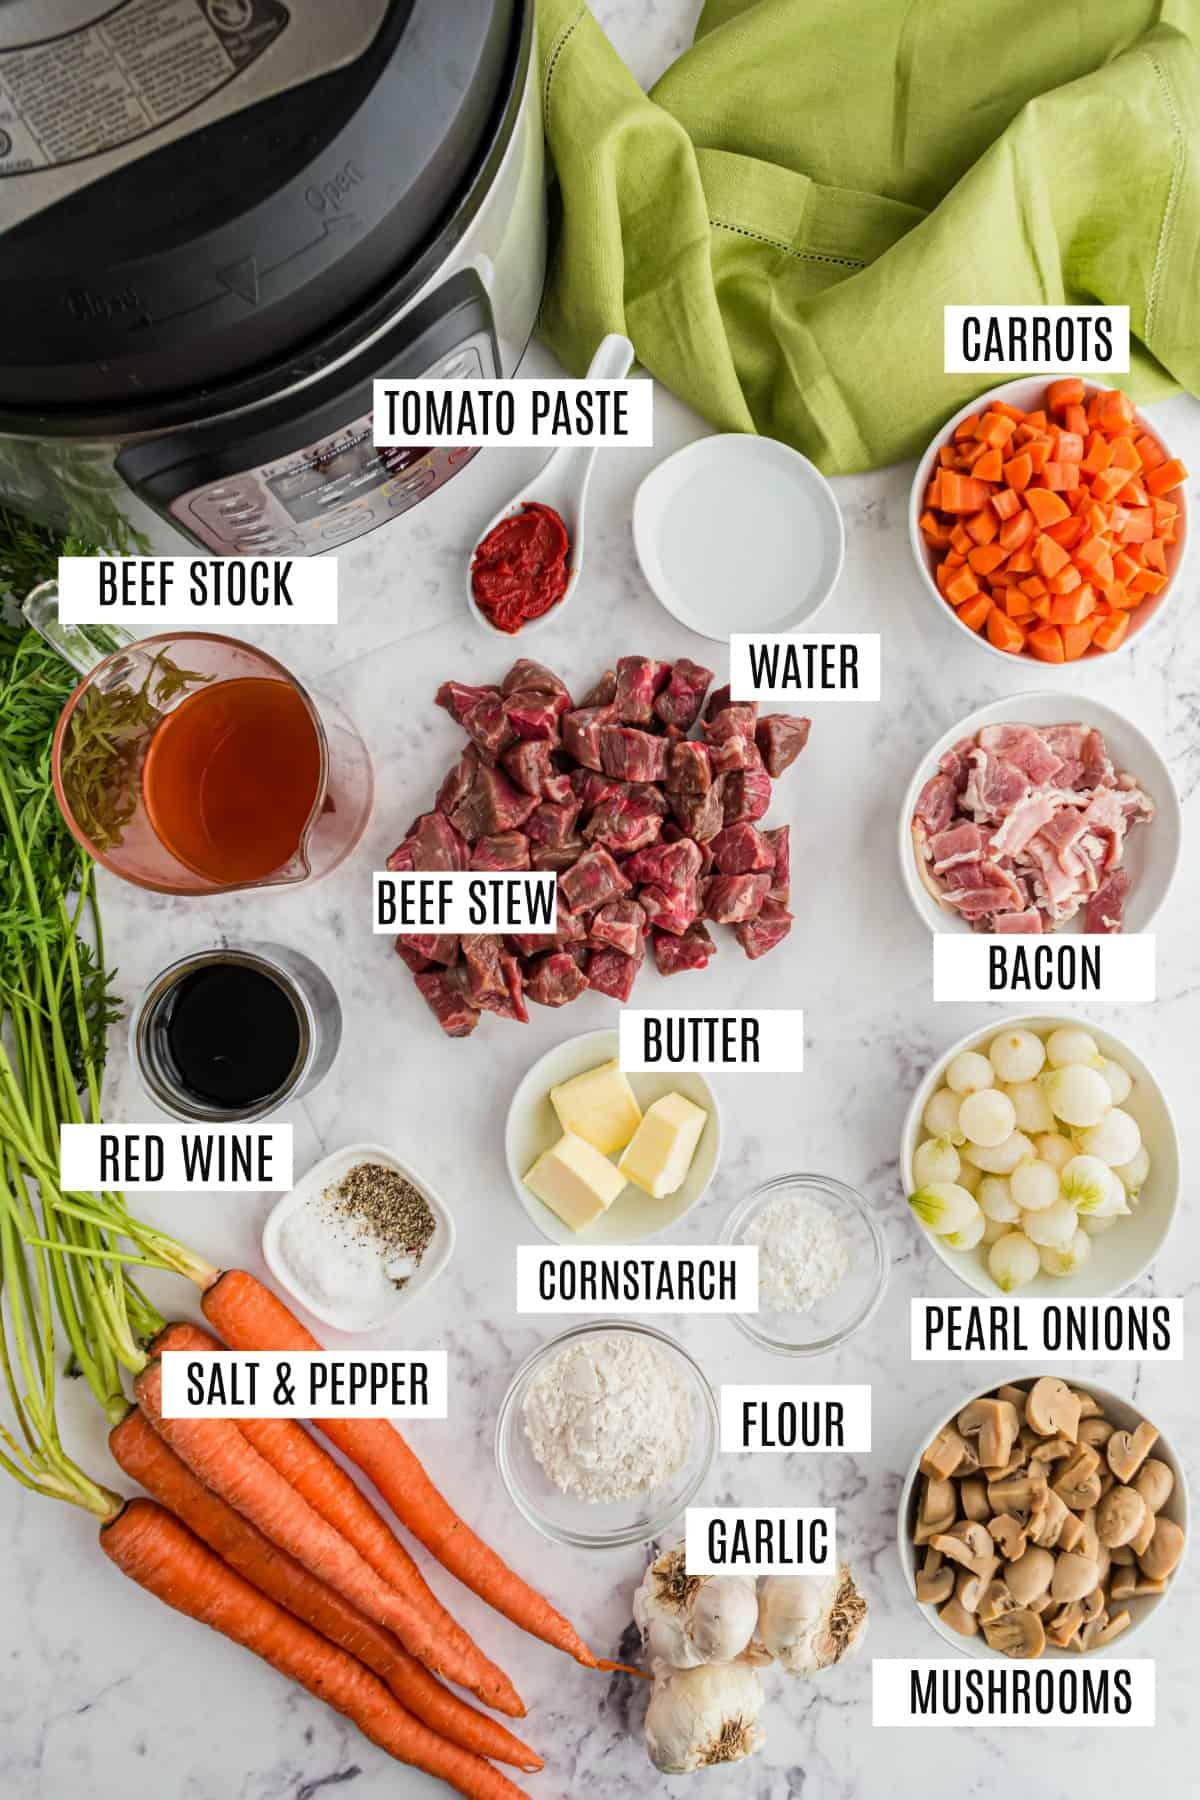 Ingredients needed to make instant pot beef bourguignon.